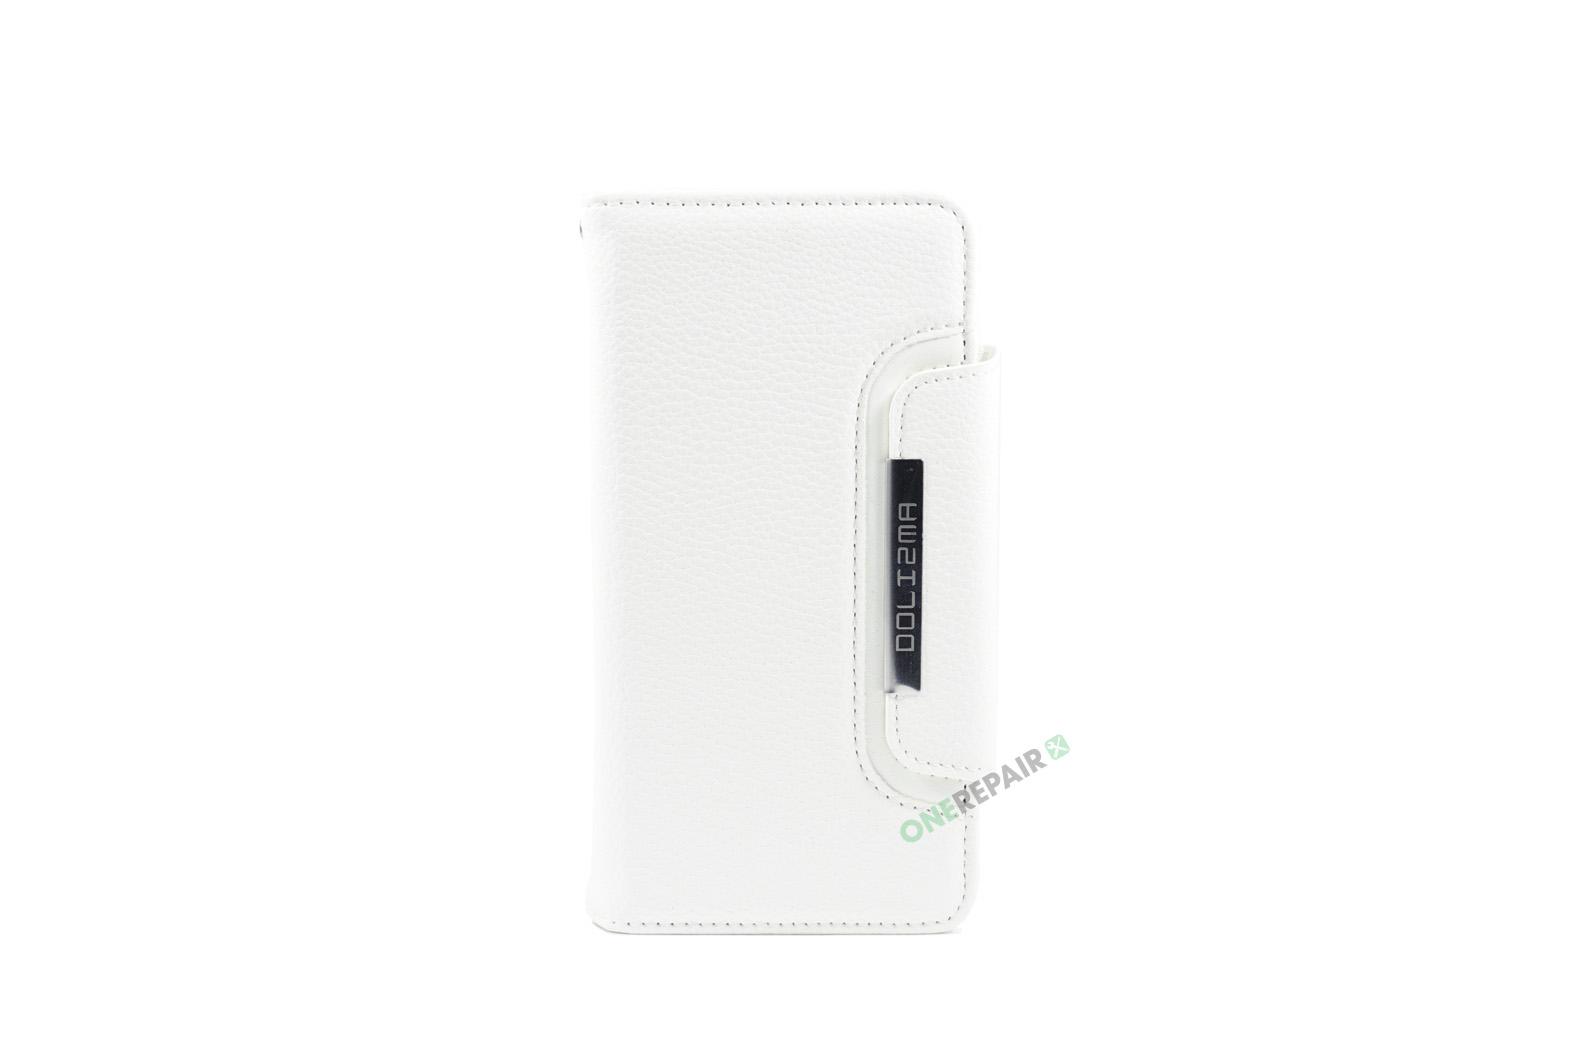 iPhone 6, 6S, A1549, A1586, A1589, A1633, A1688, A1700, A1691, Apple, Flipcover, Magnetcover, 2 i en, Pung, Fold, Cover, Plads til kort, Hvid